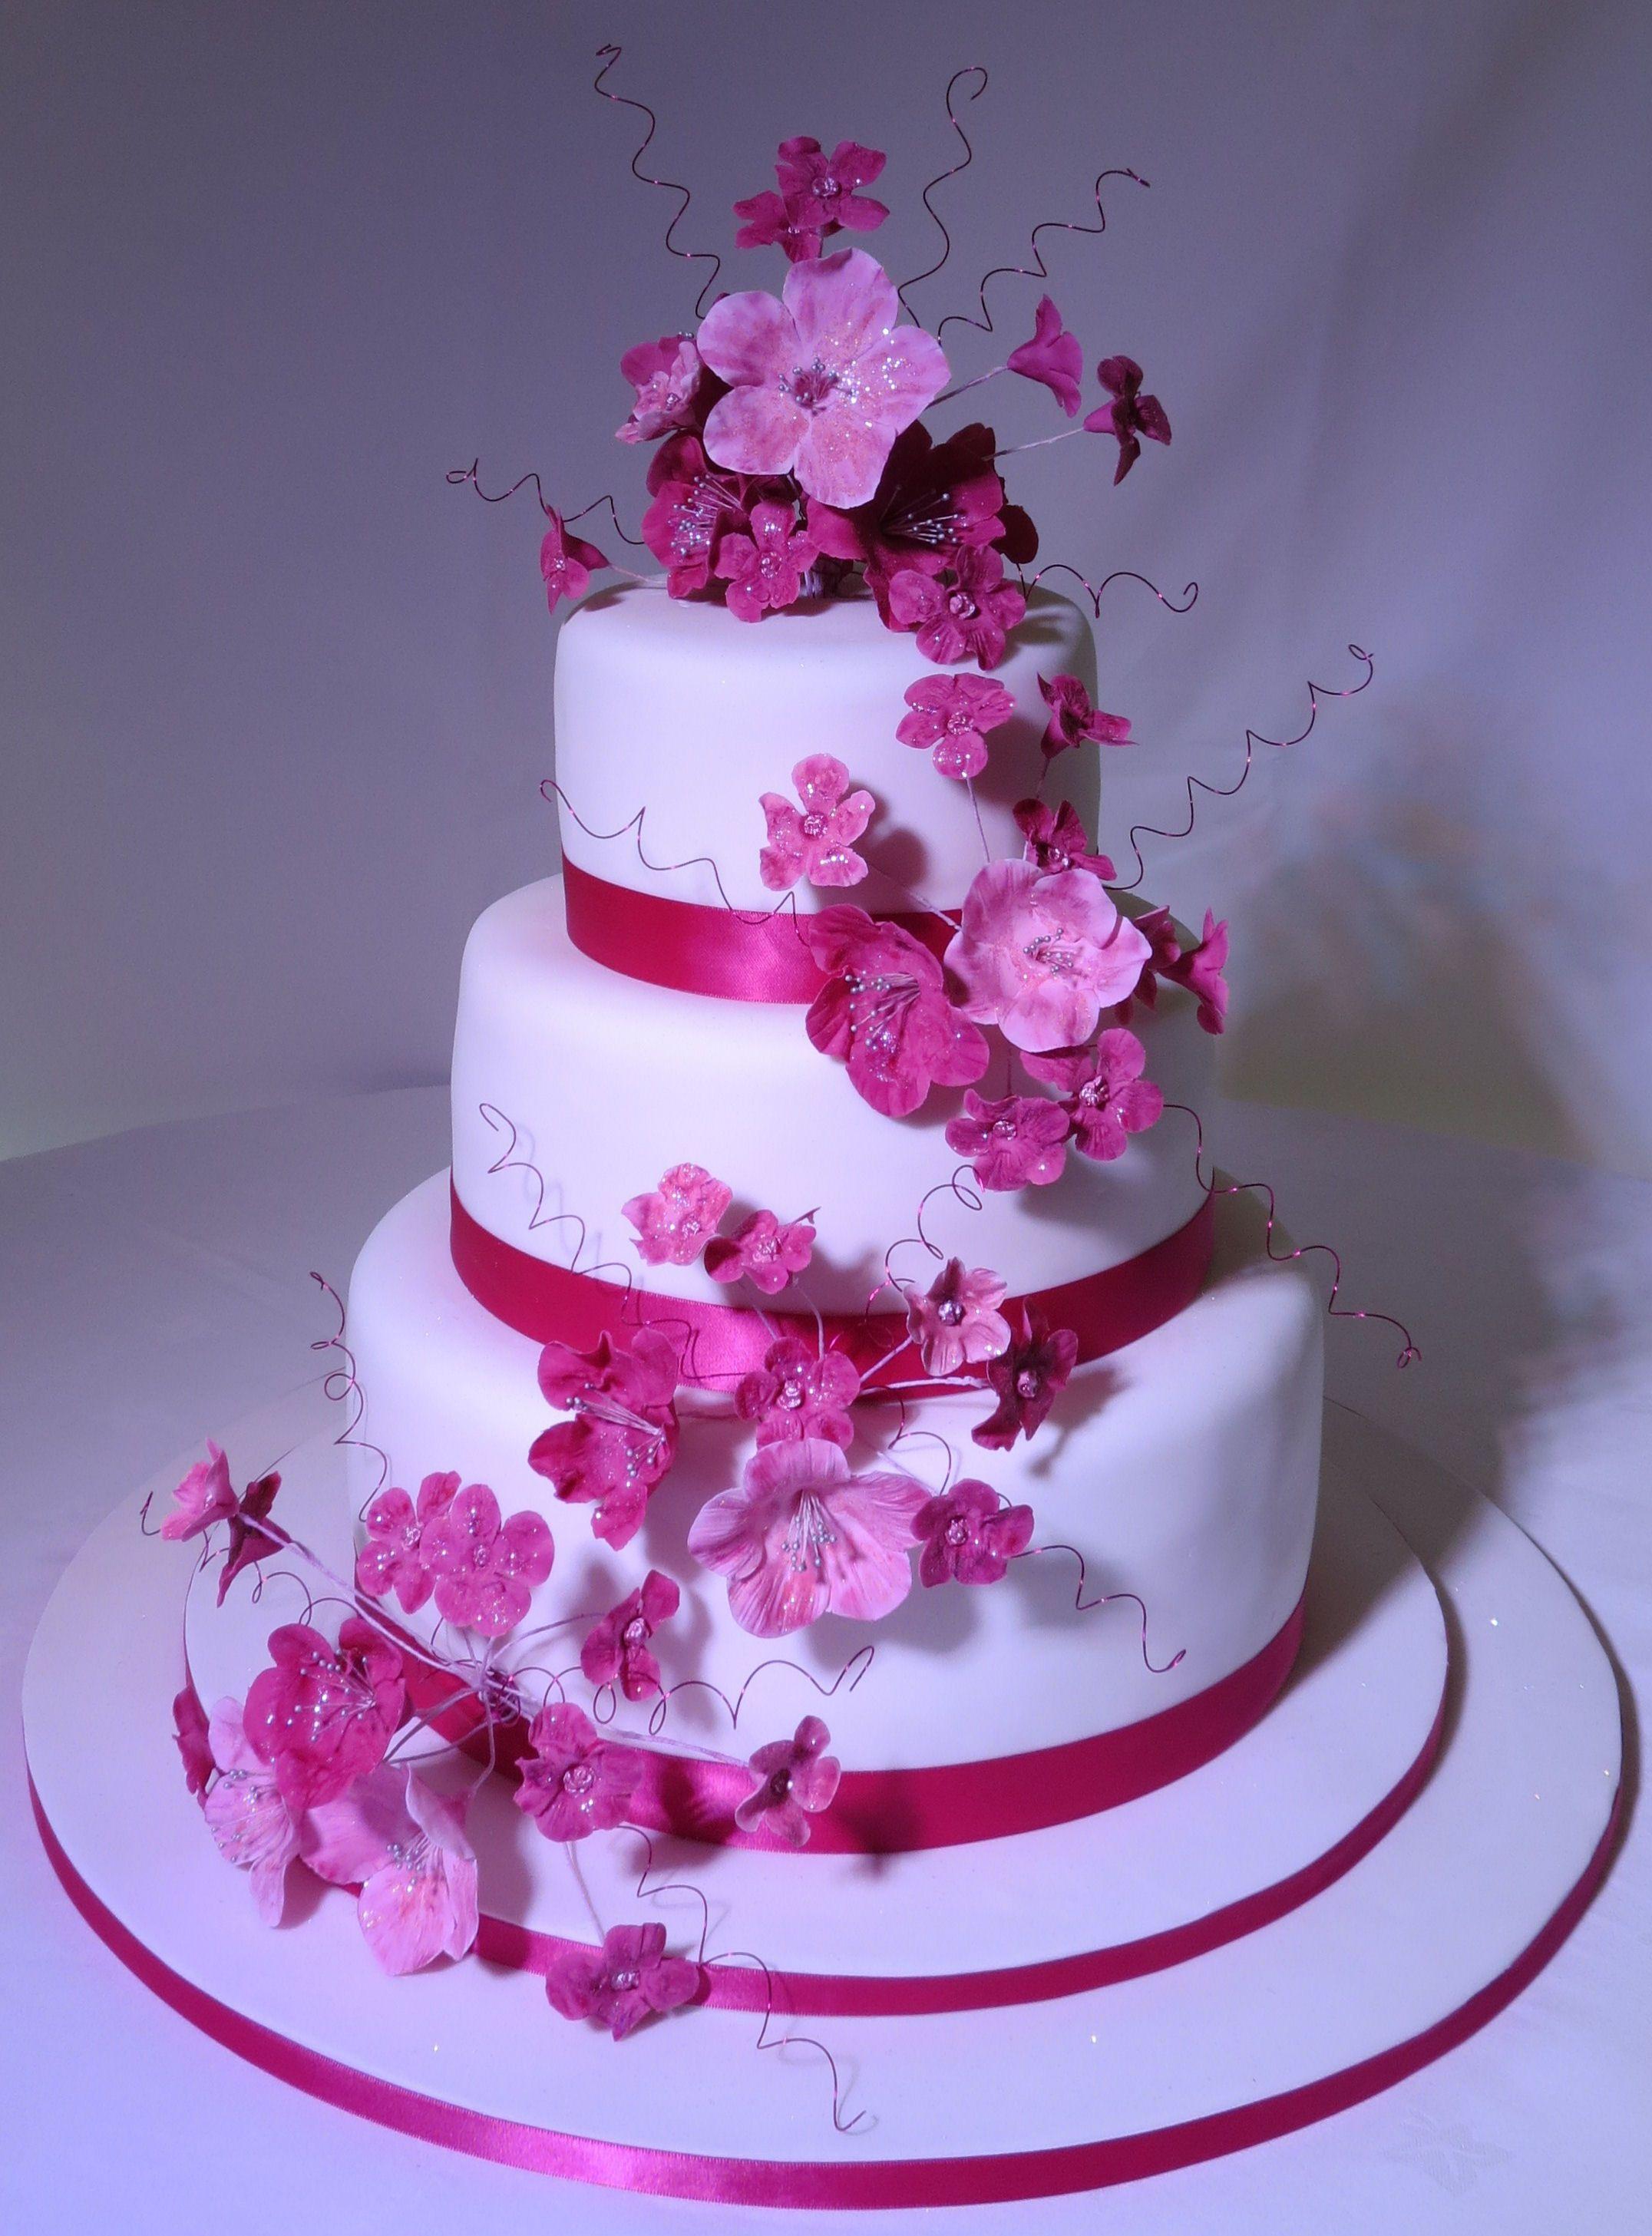 Fuschia pink flower wedding cake cakes pinterest wedding cake fuschia pink flower wedding cake mightylinksfo